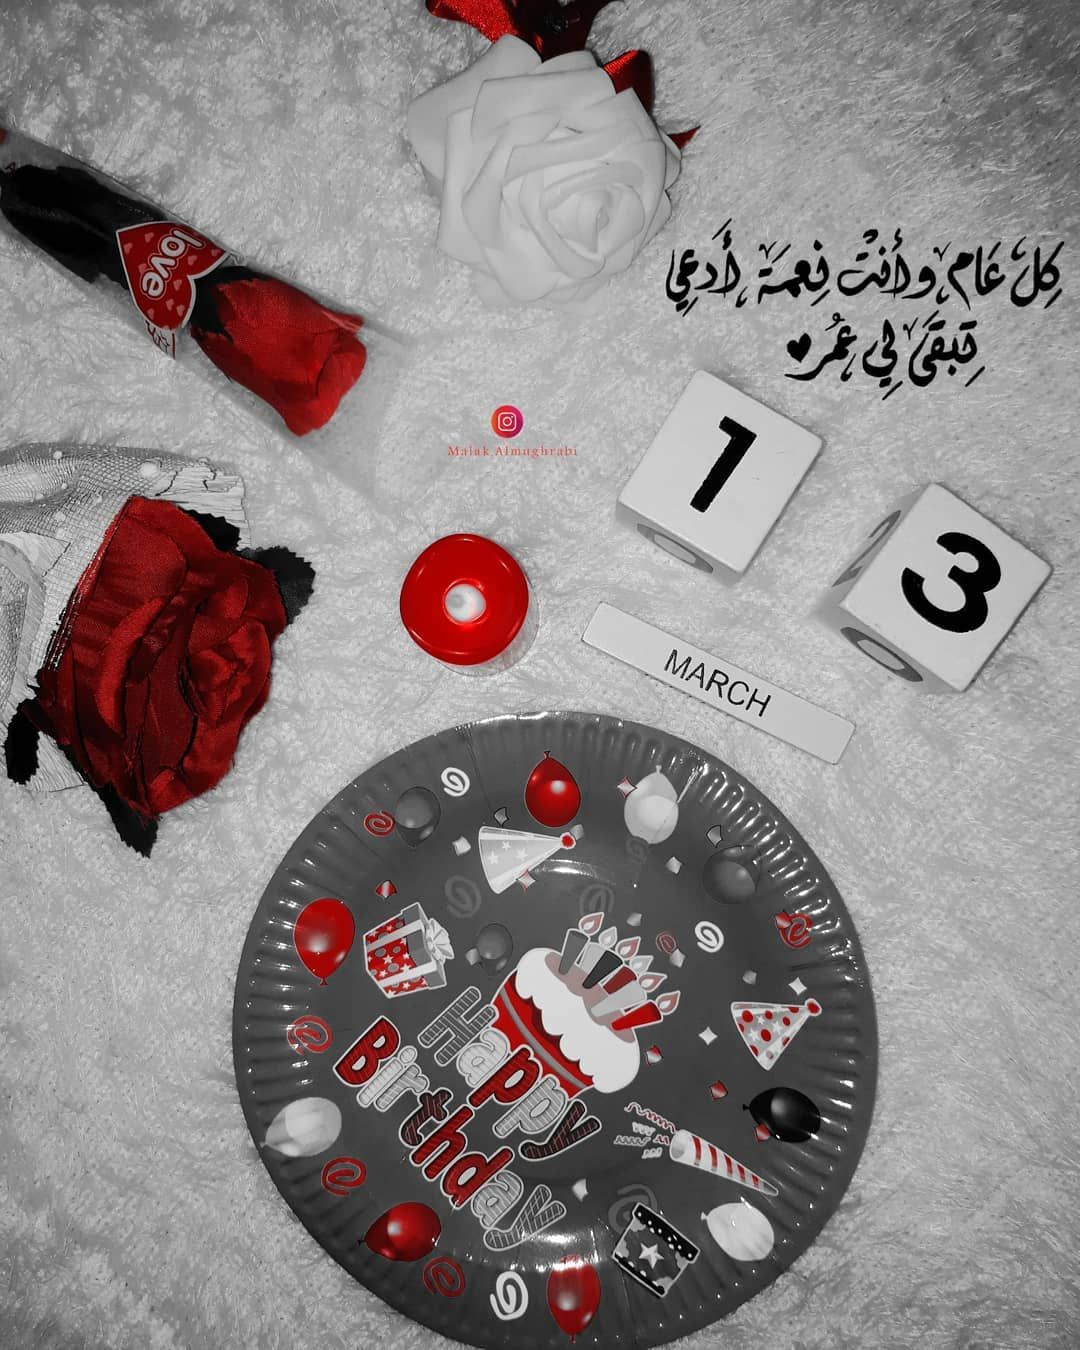 كل عام وأنت نعمة أدعي تبقى لي عمر Ali Ahmed Almughrabi اكسبلور فولو Malak Almughrabi Palestine Gazastrip Gaza Exp Birthda Cards Playing Cards